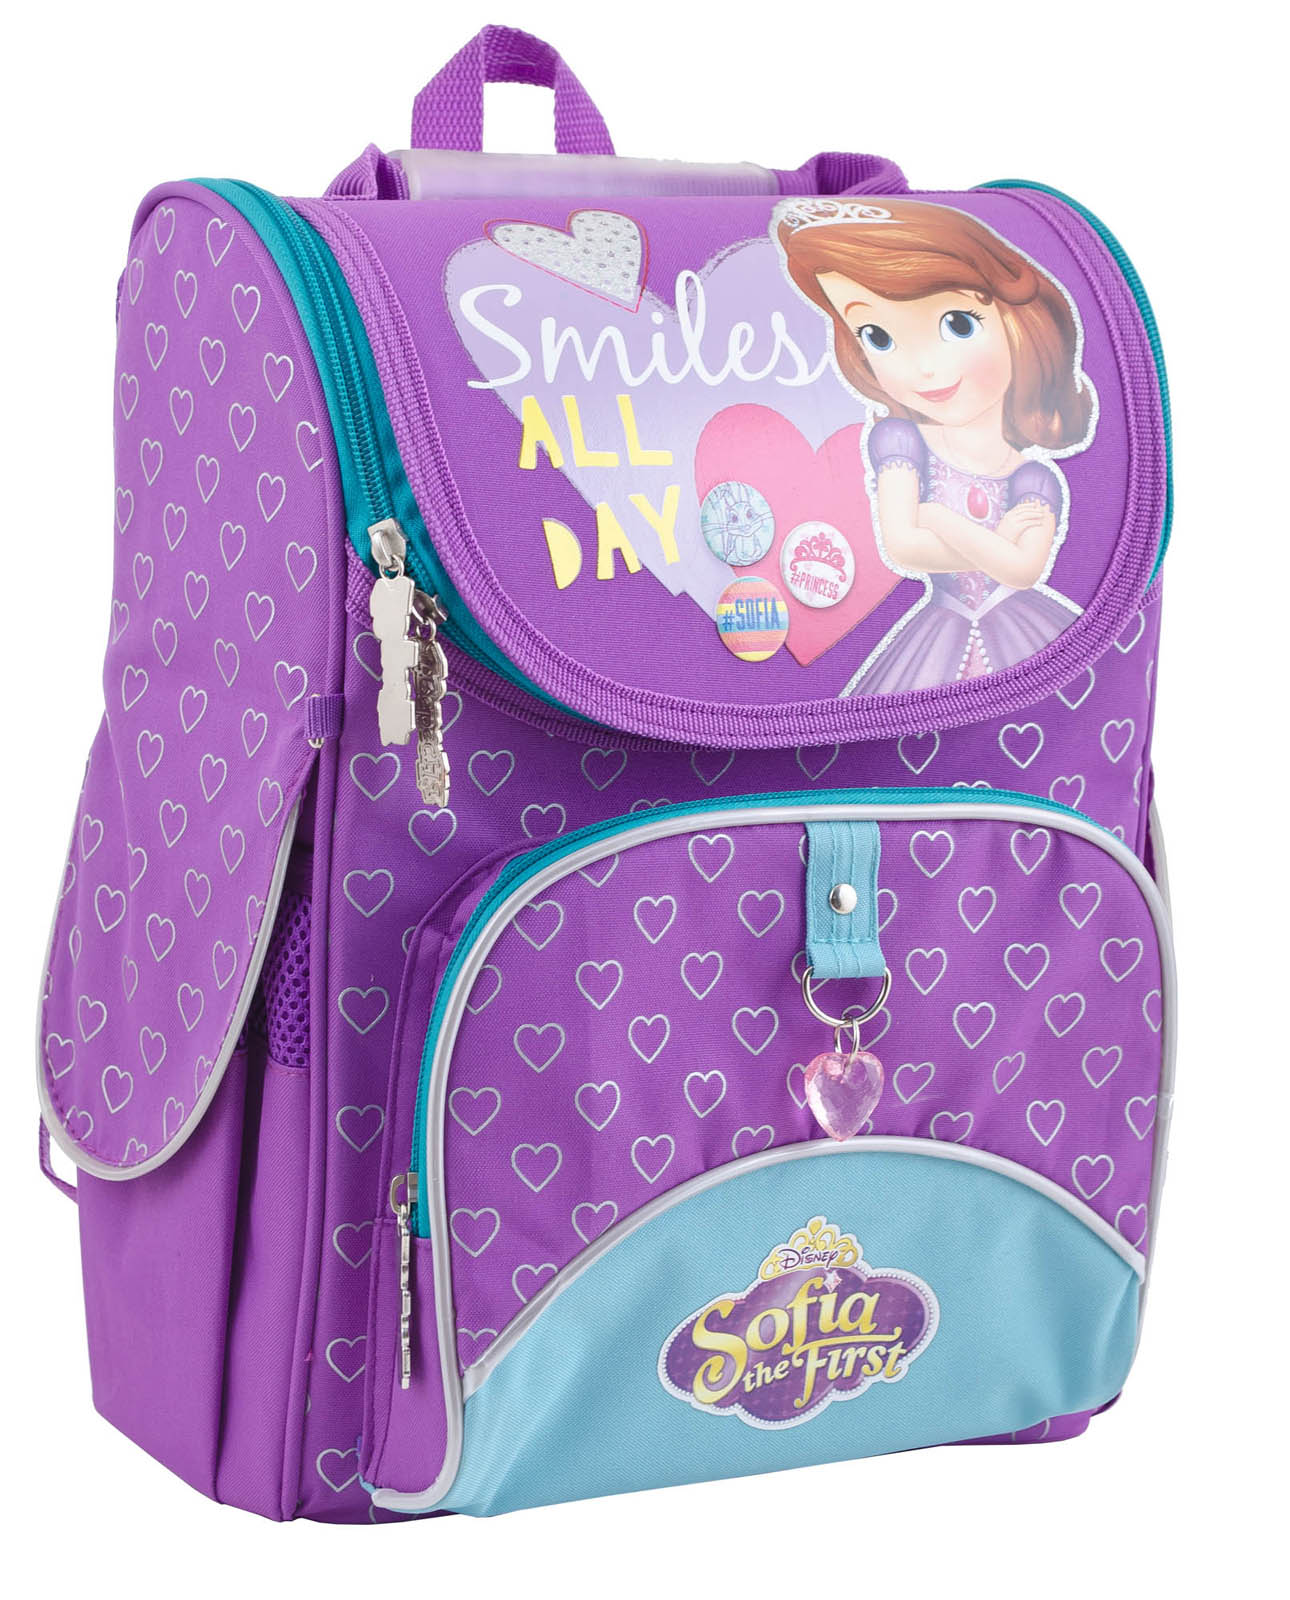 Рюкзак каркасный H-11 Sofia purple, 34*26*14